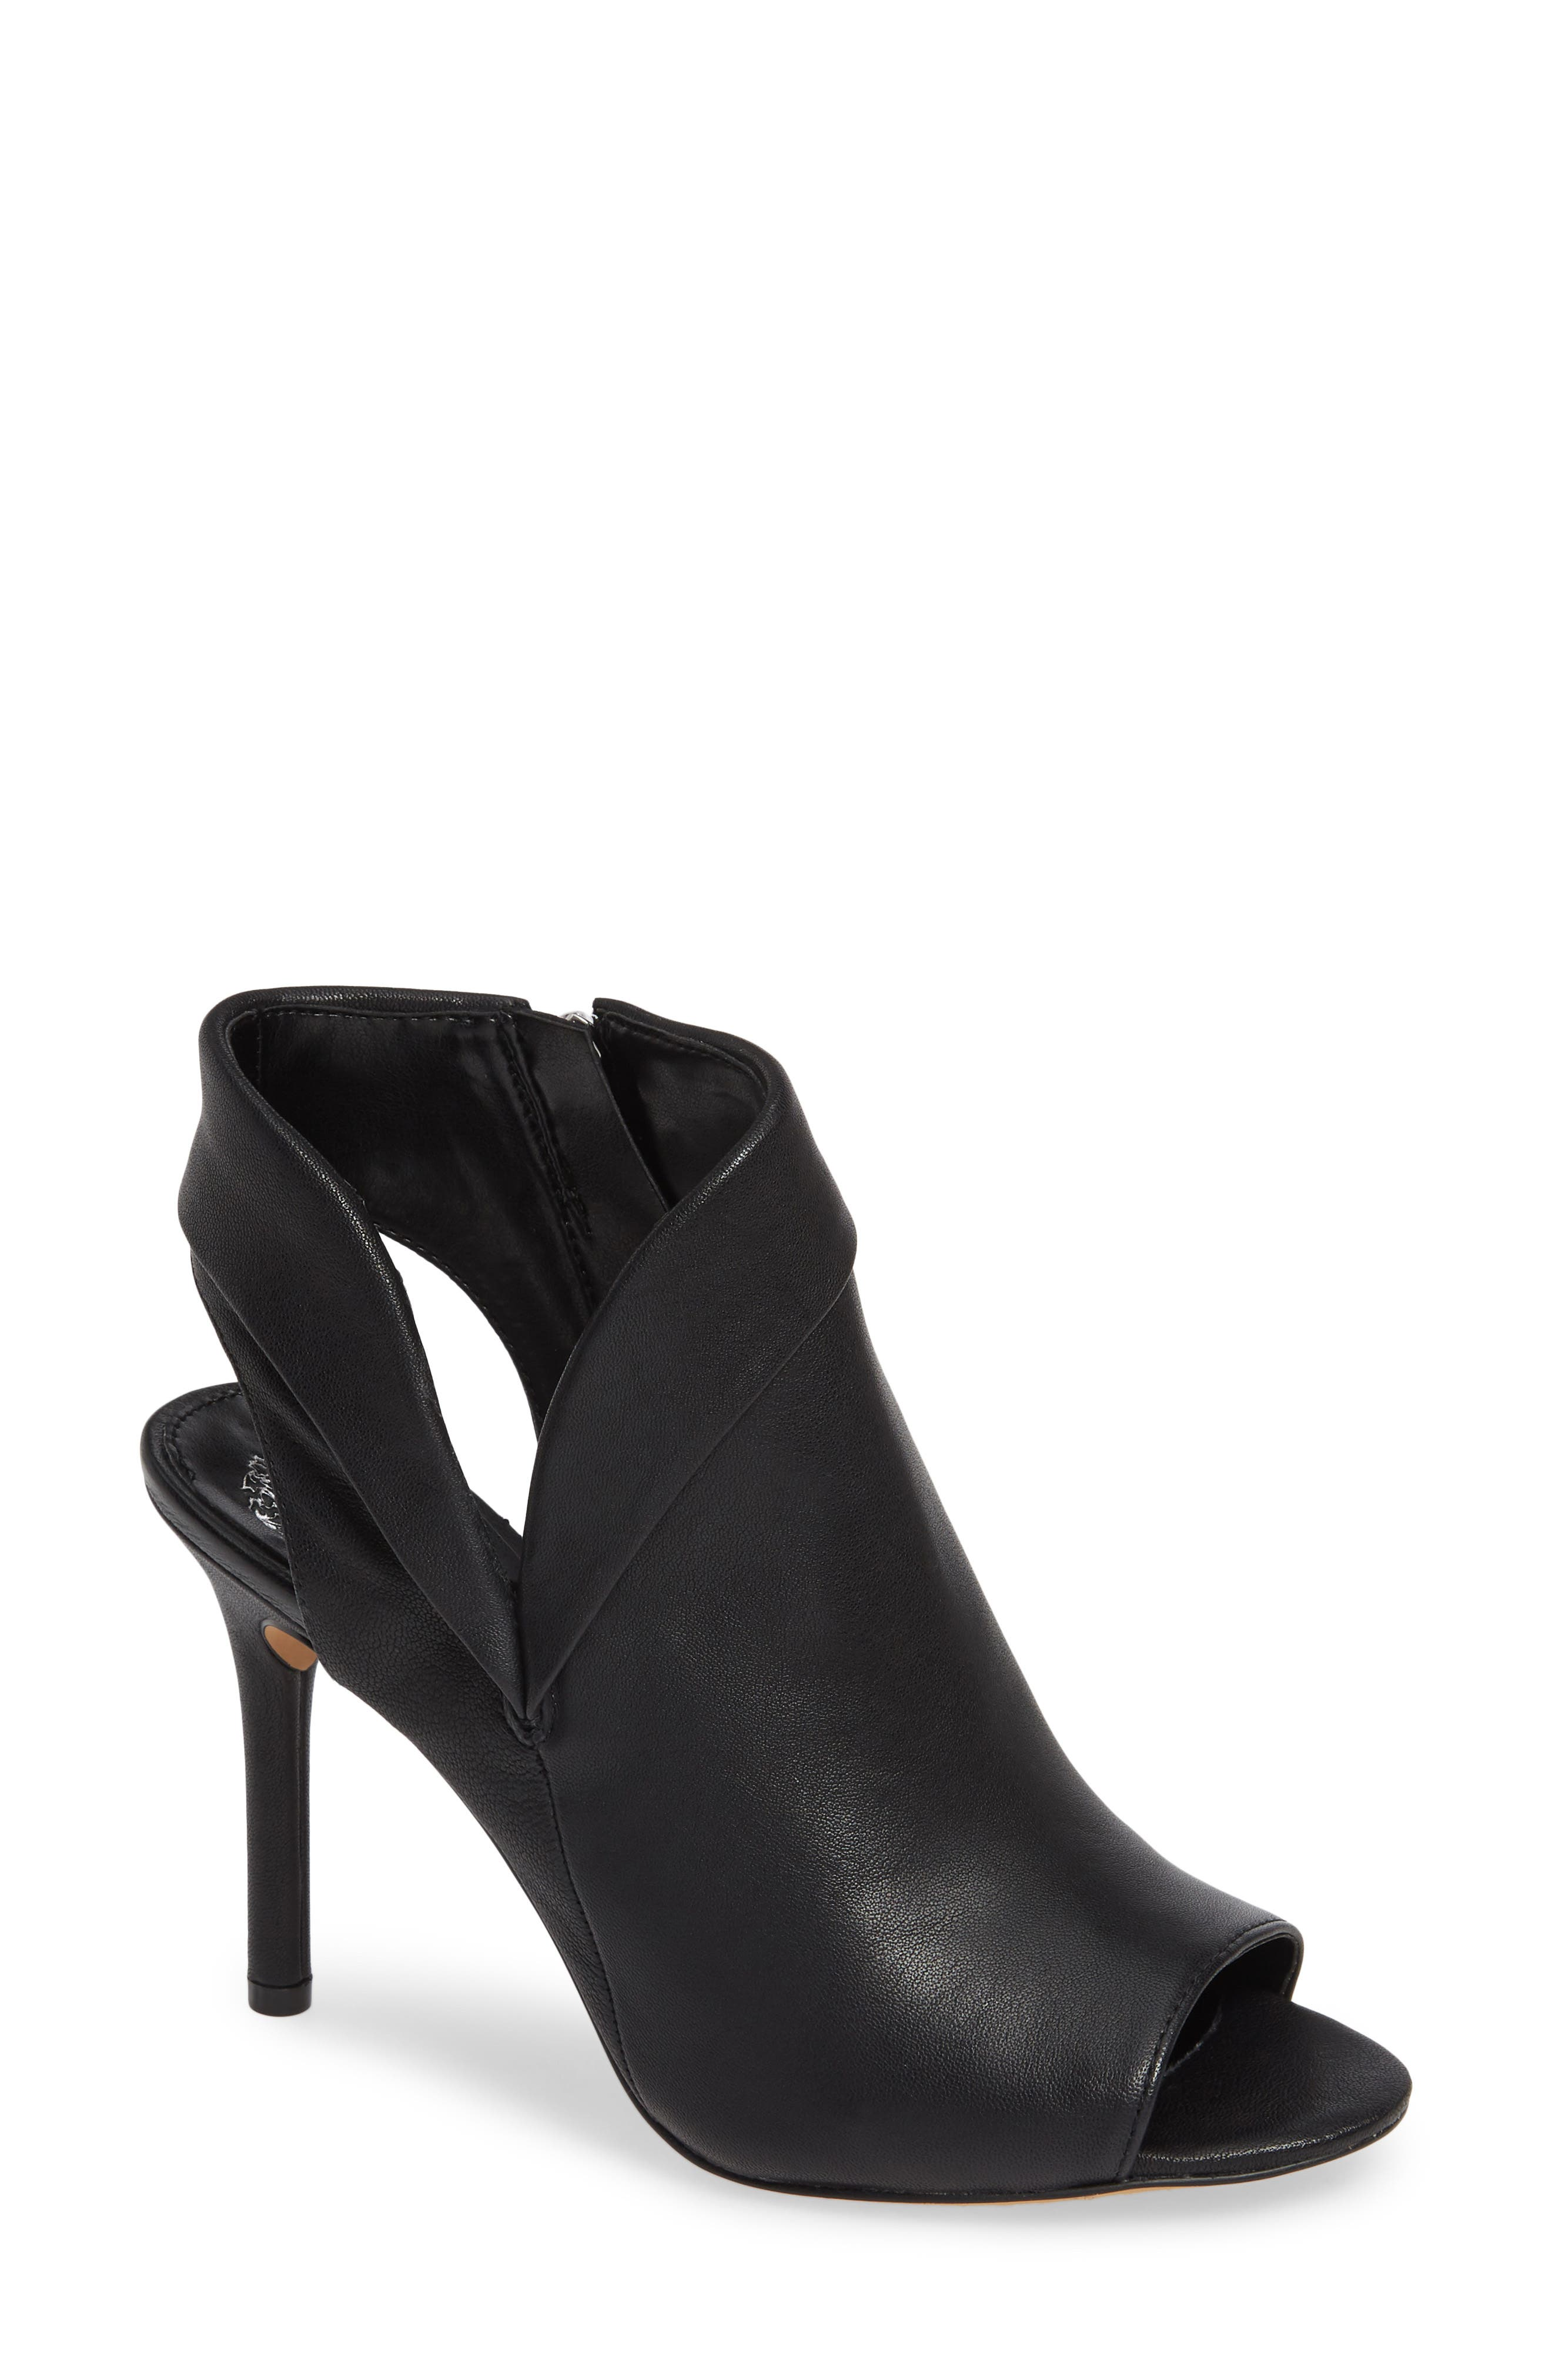 Cholia Asymmetrical Sandal Bootie,                             Main thumbnail 1, color,                             BLACK LEATHER